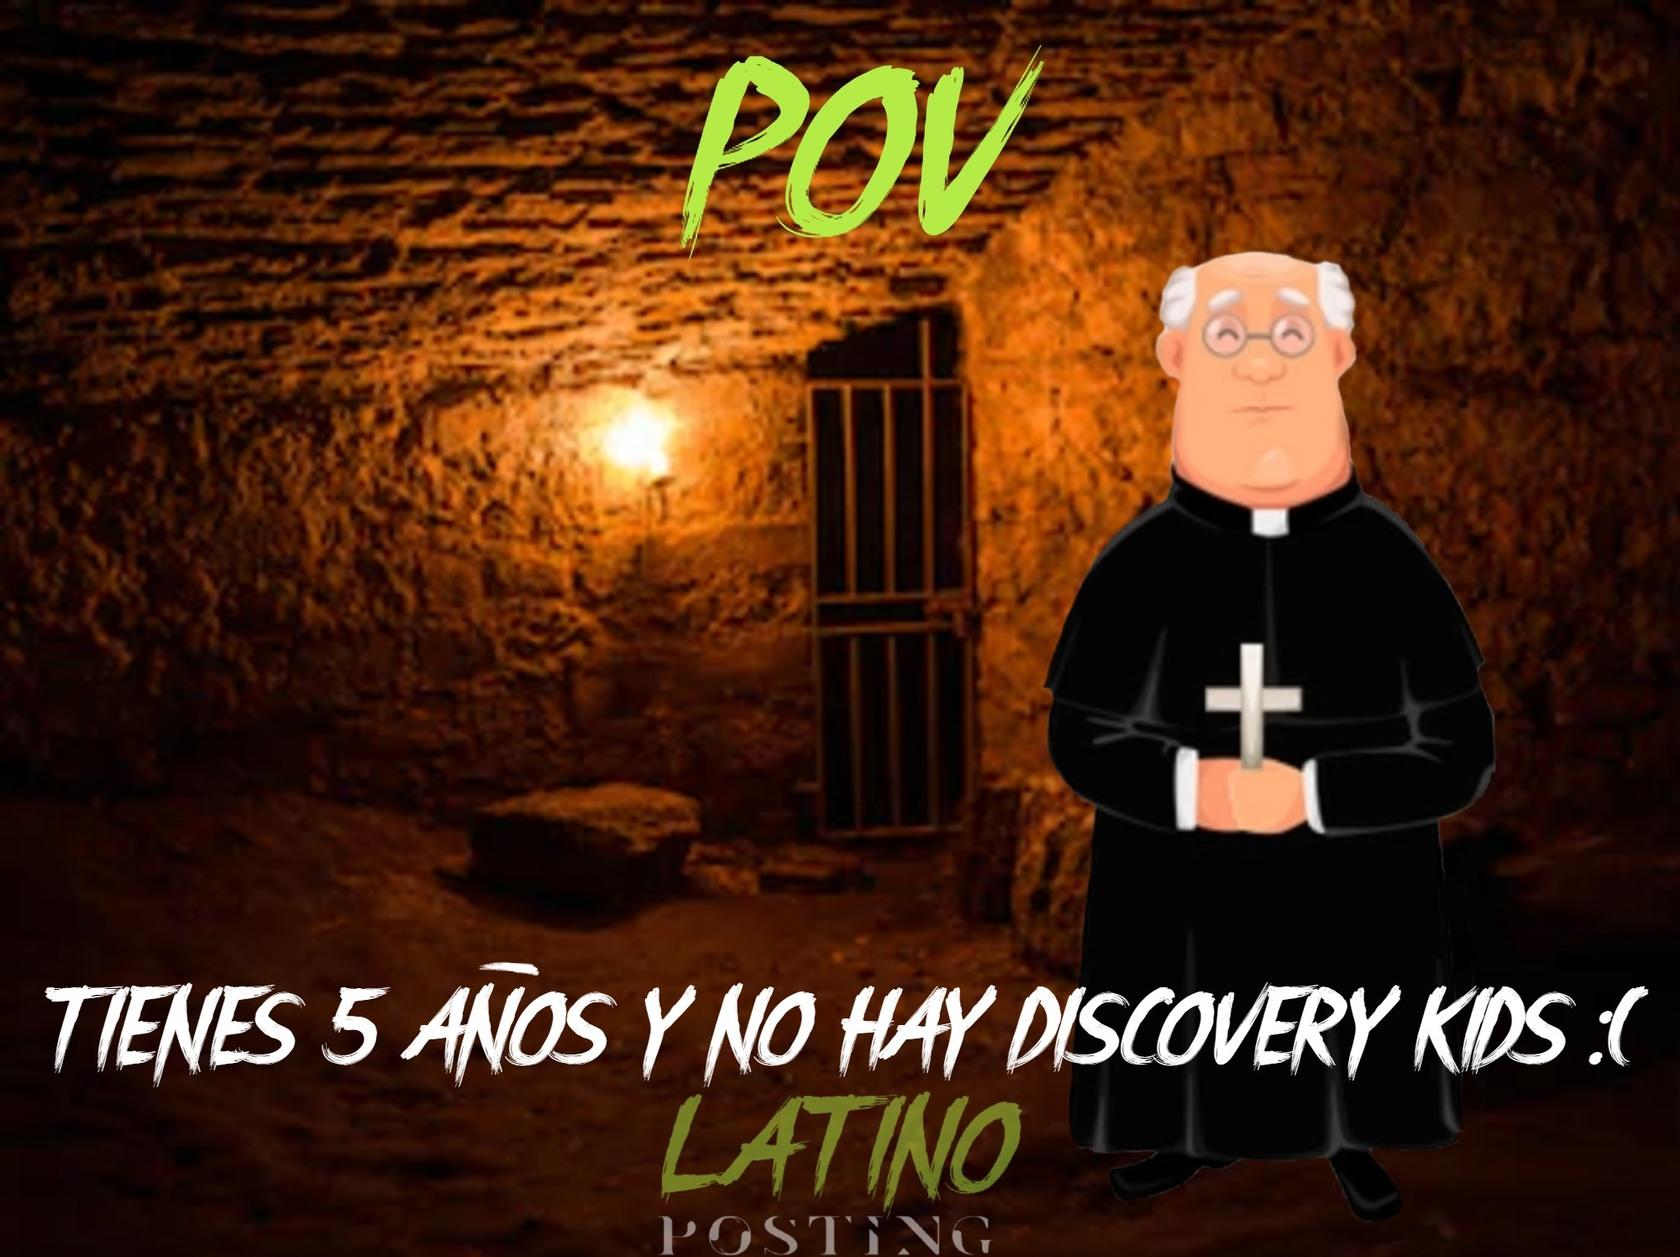 No hay Discovery Kids :C - meme